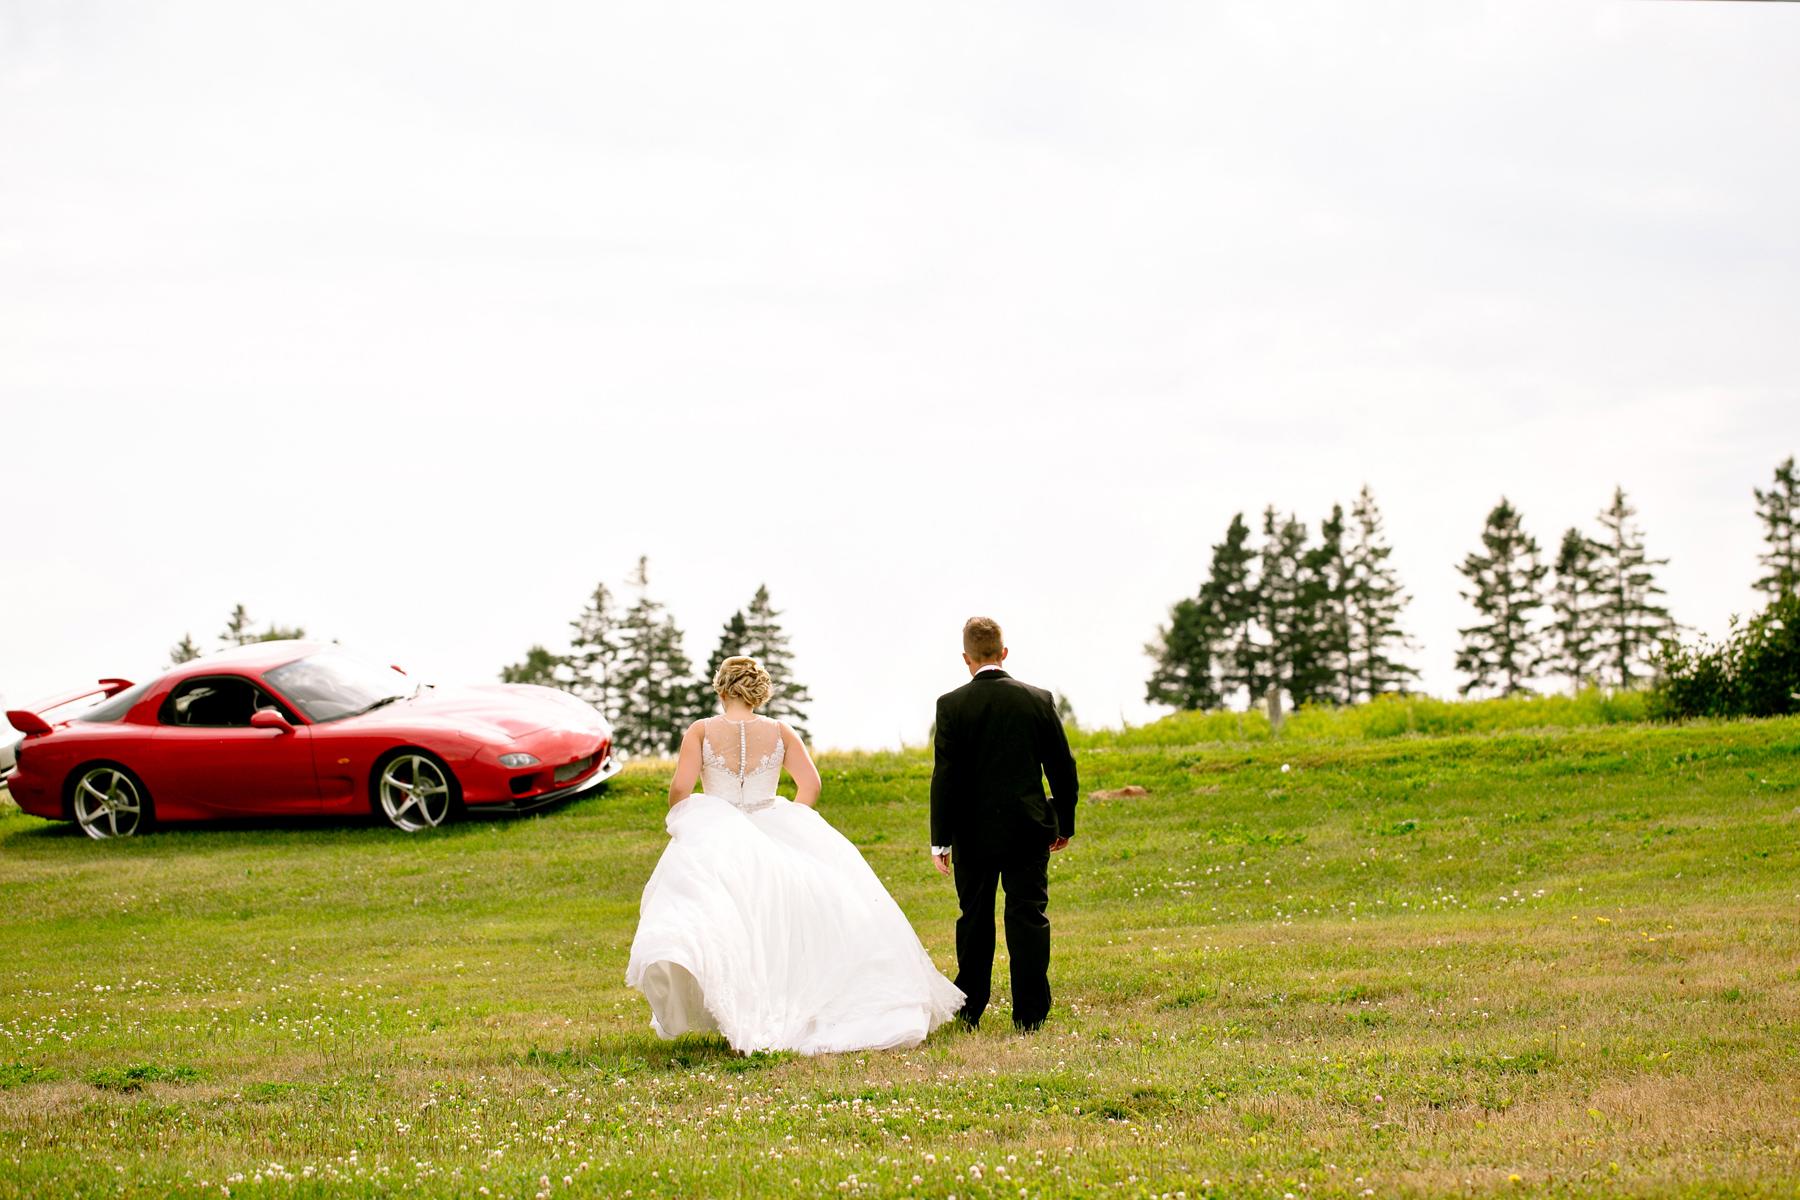 035-awesome-pei-wedding-photography-kandisebrown-jg2016